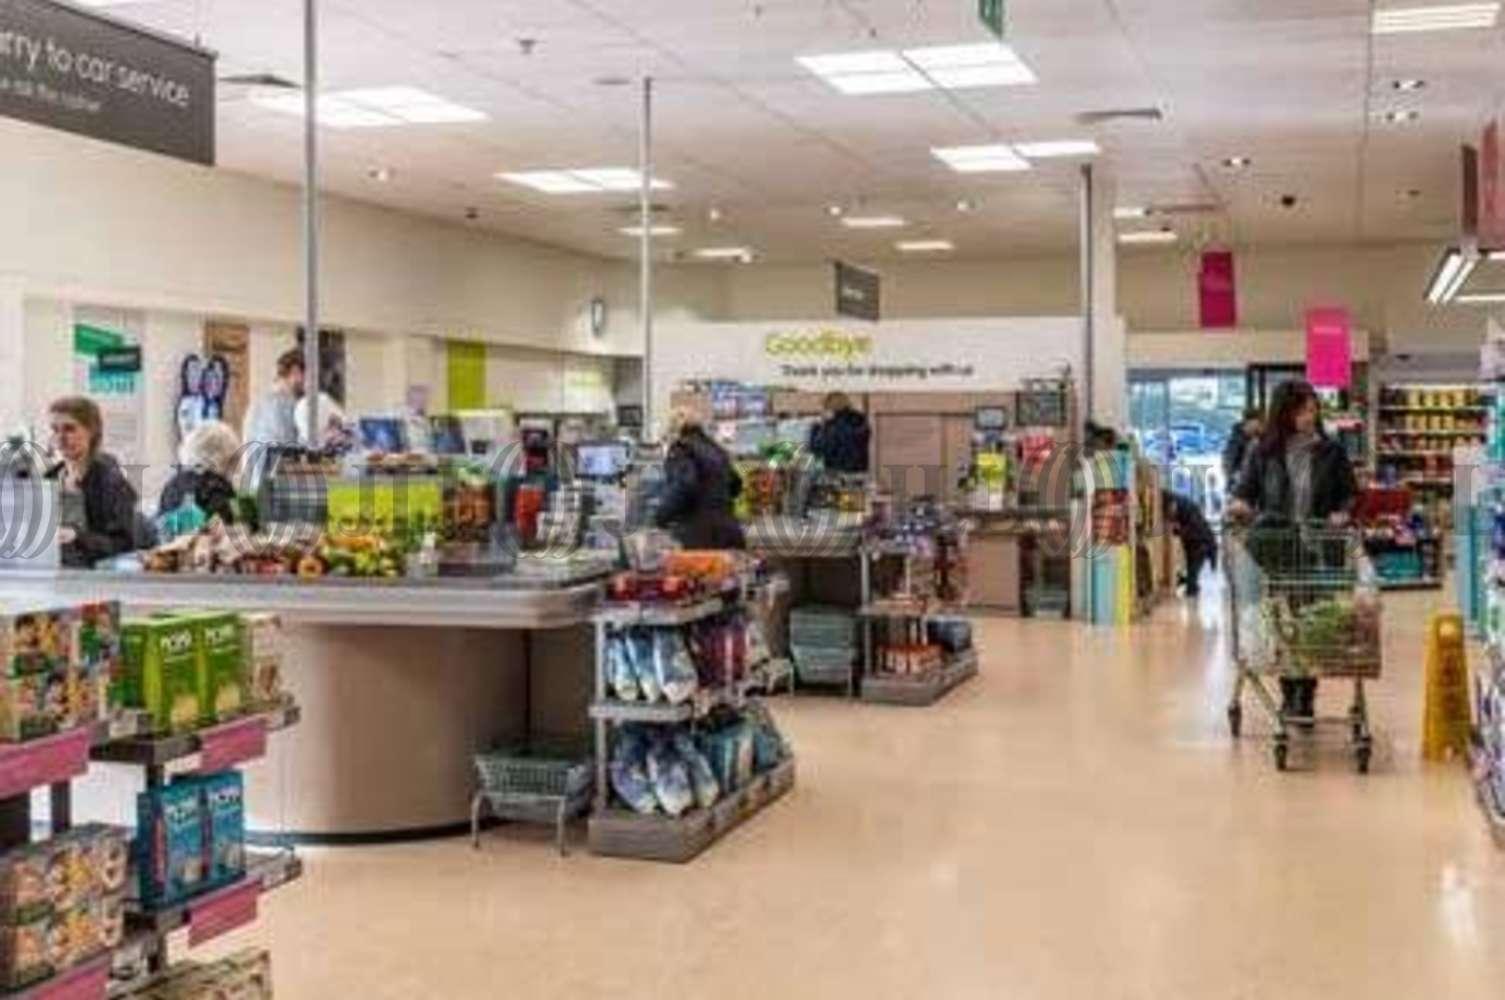 Retail shopping centre Stamford, PE9 2PR - Waitrose - 15